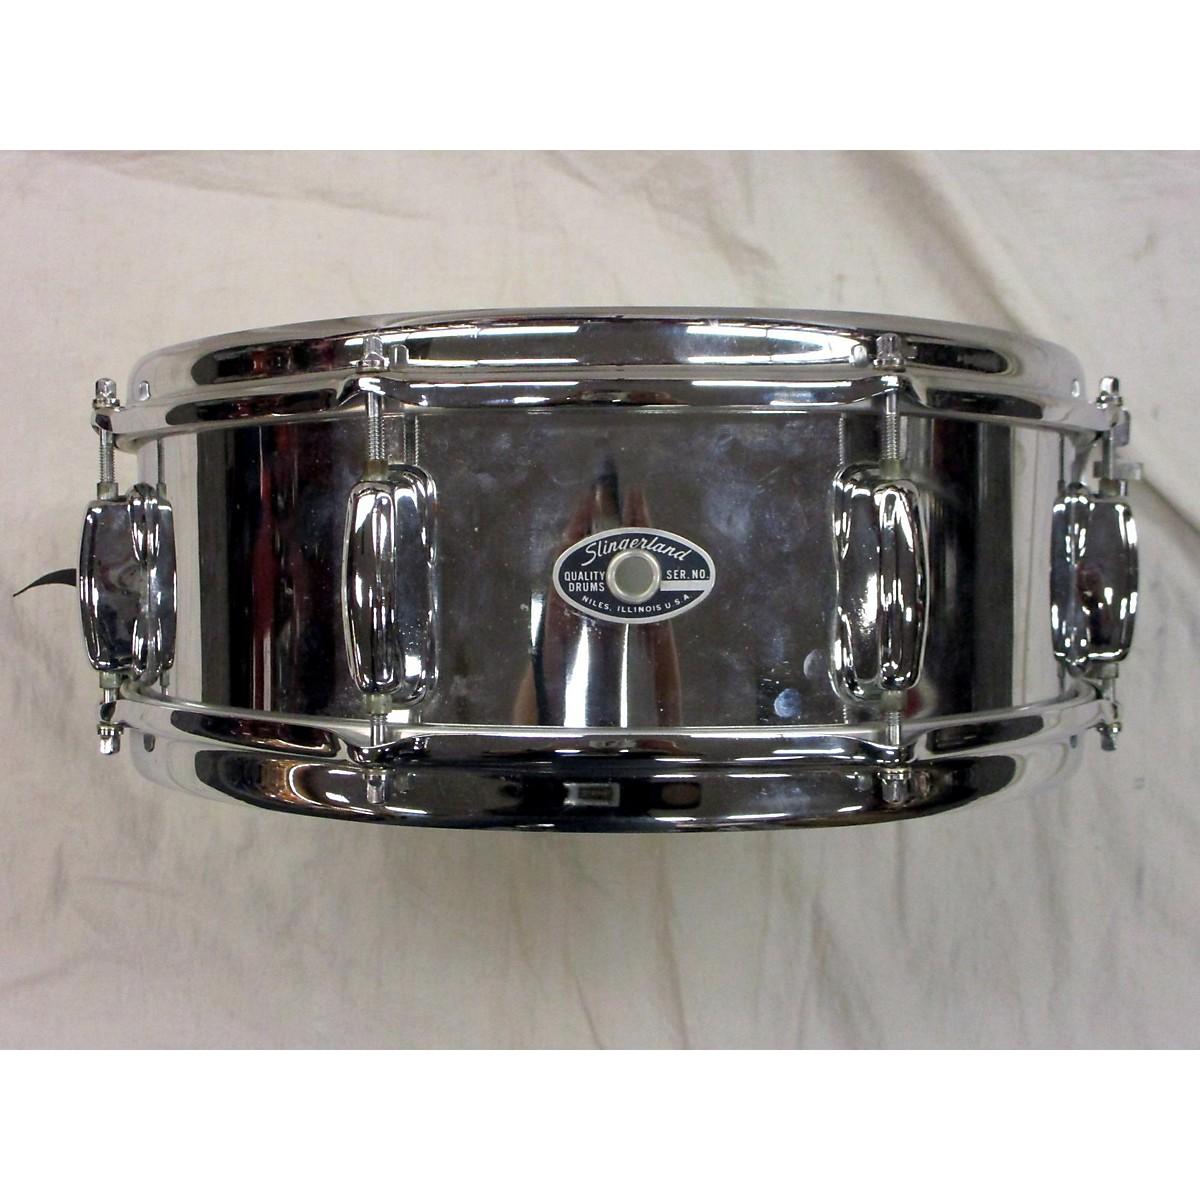 Slingerland 1970s 5X14 Snare Drum